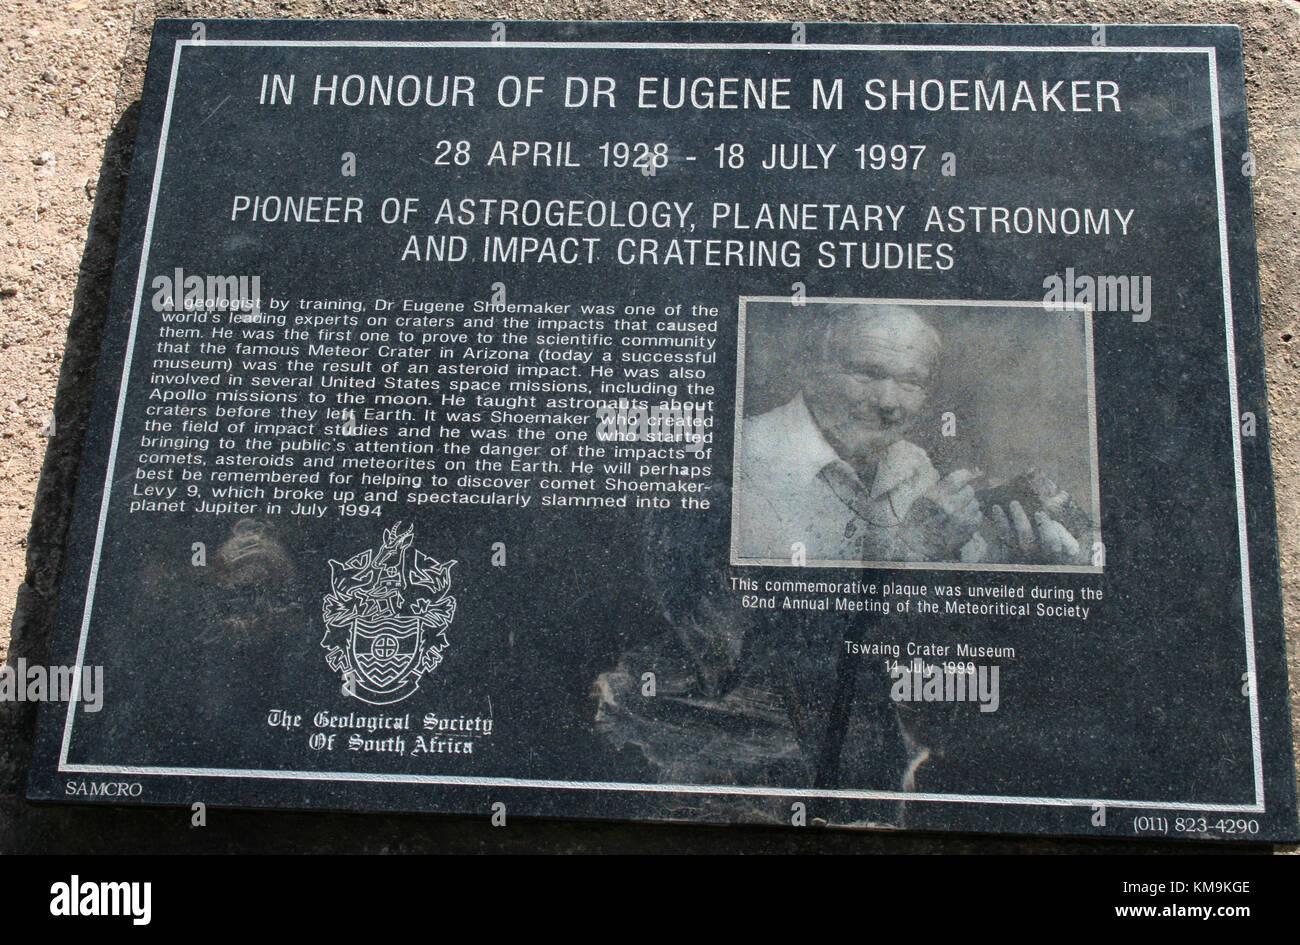 Dr Eugene M Shoemaker memorial at Tswaing Crater, Pretoria, South Africa - Stock Image